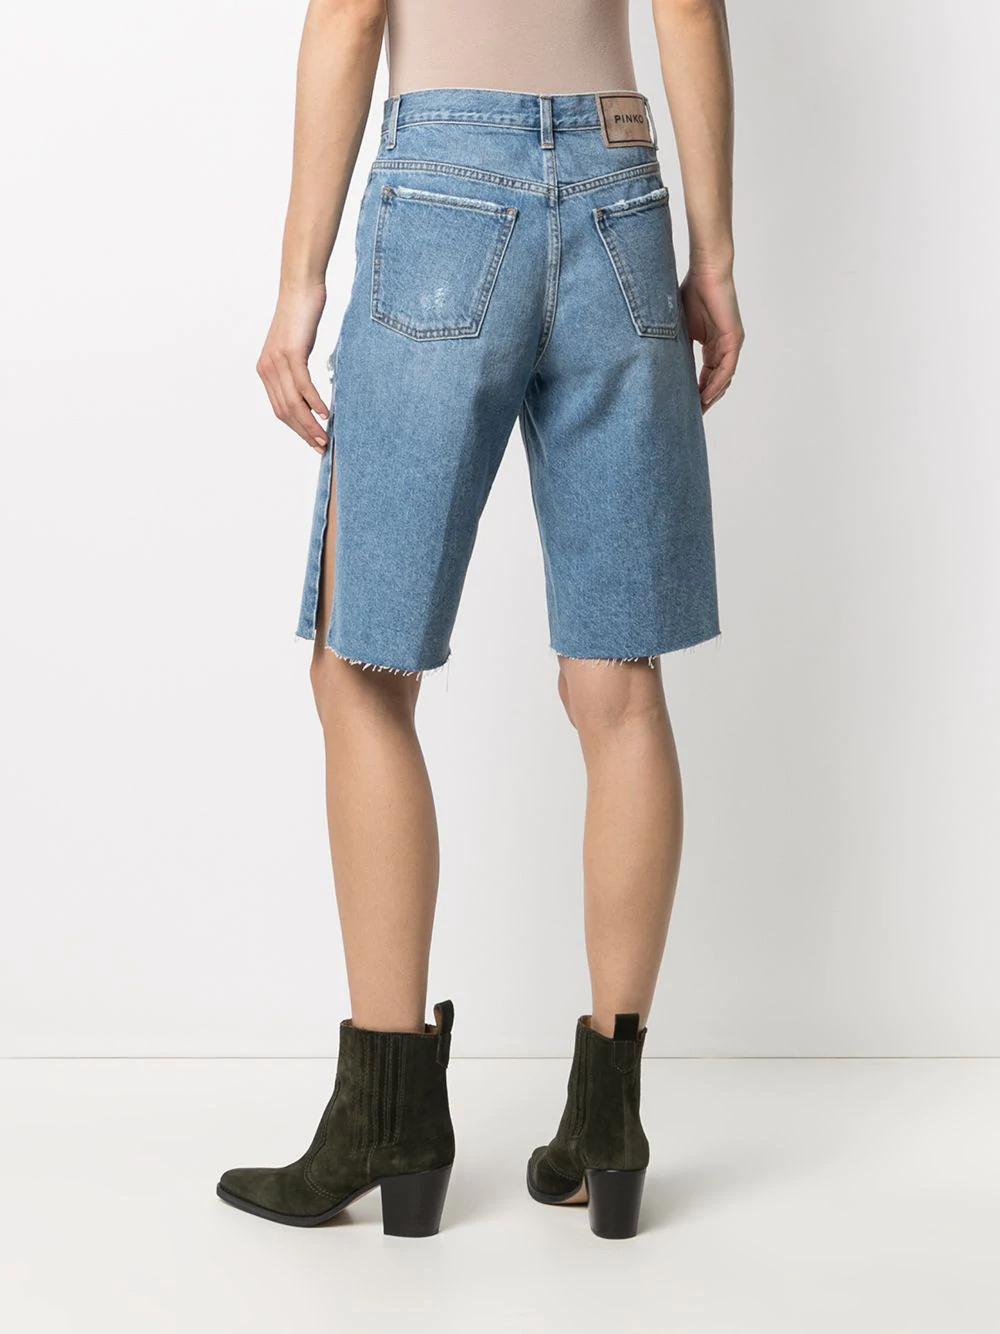 Pinko Slit Knee-length Shorts 266лв